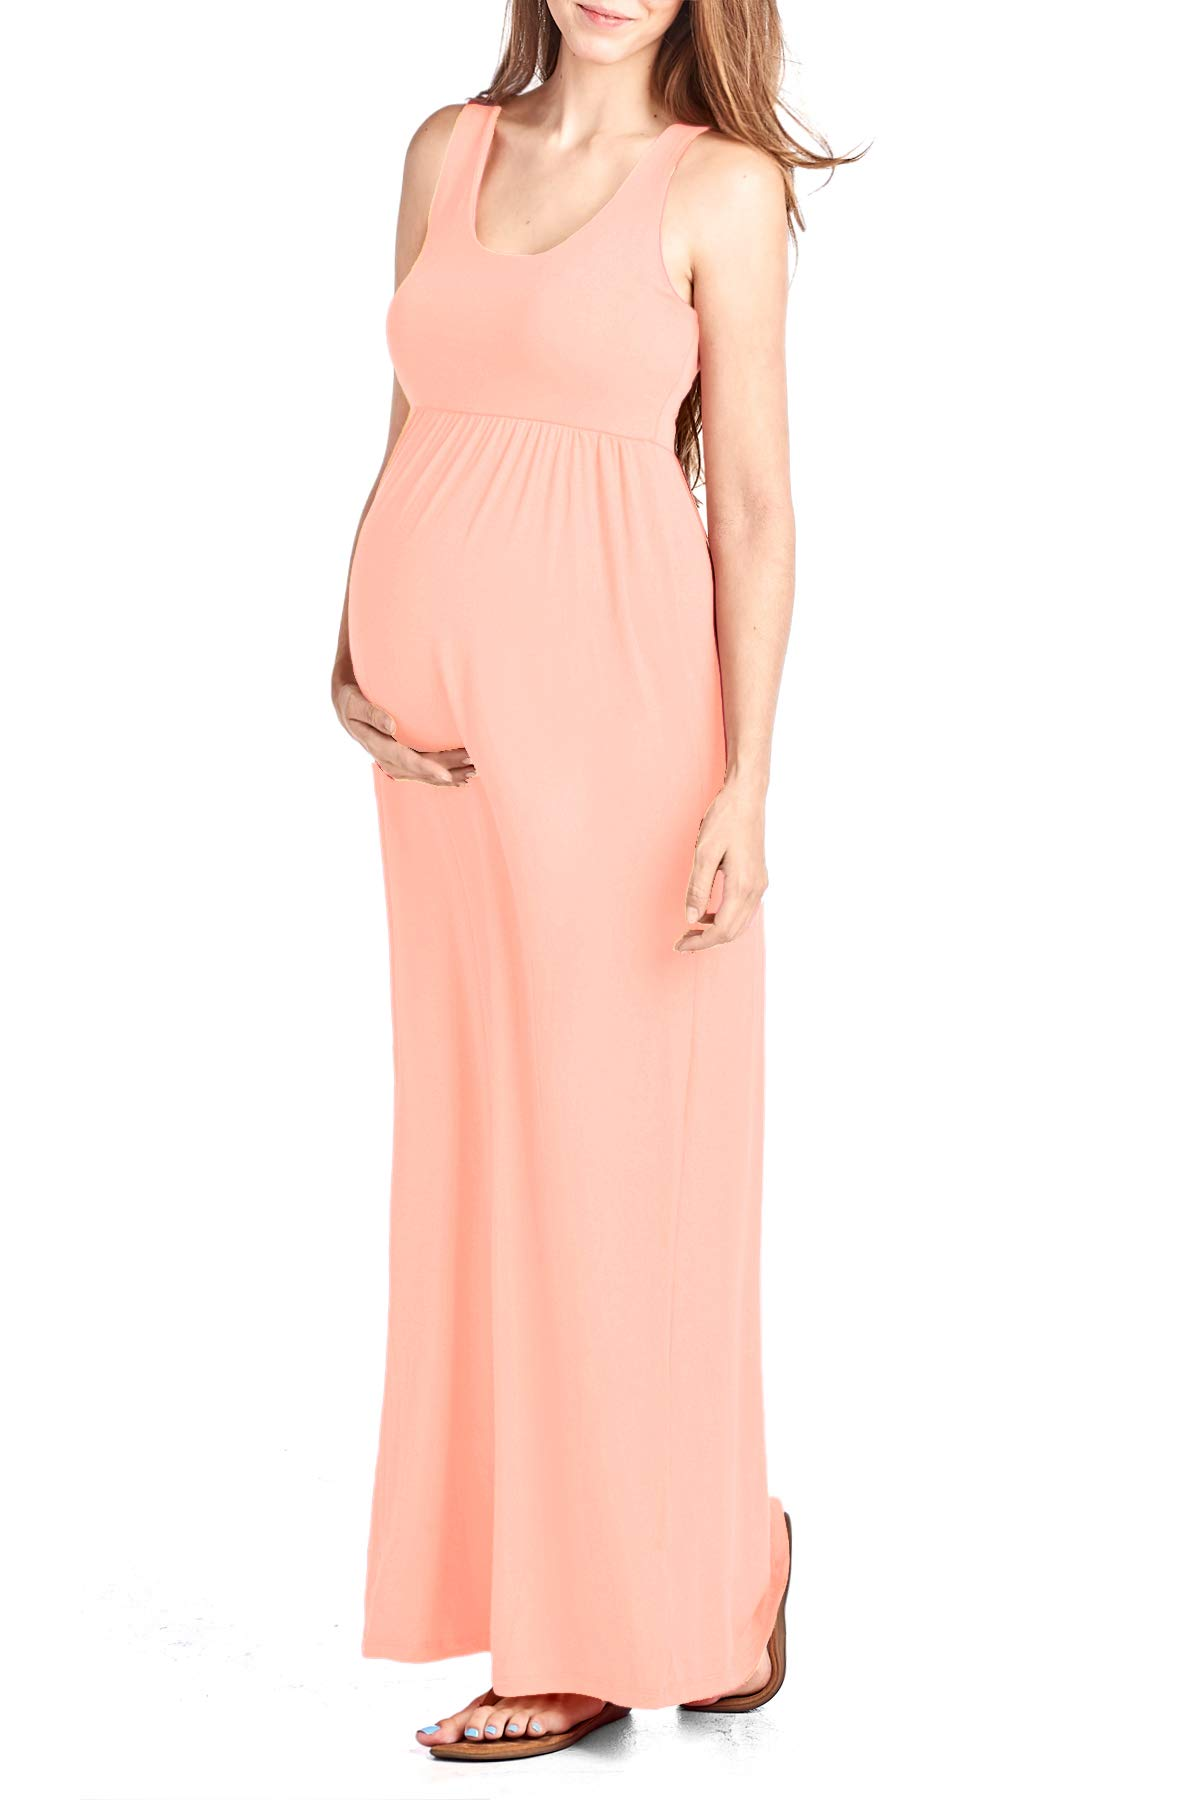 Beachcoco Women's Maternity Maxi Tank Dress Made in USA (M, Peach)